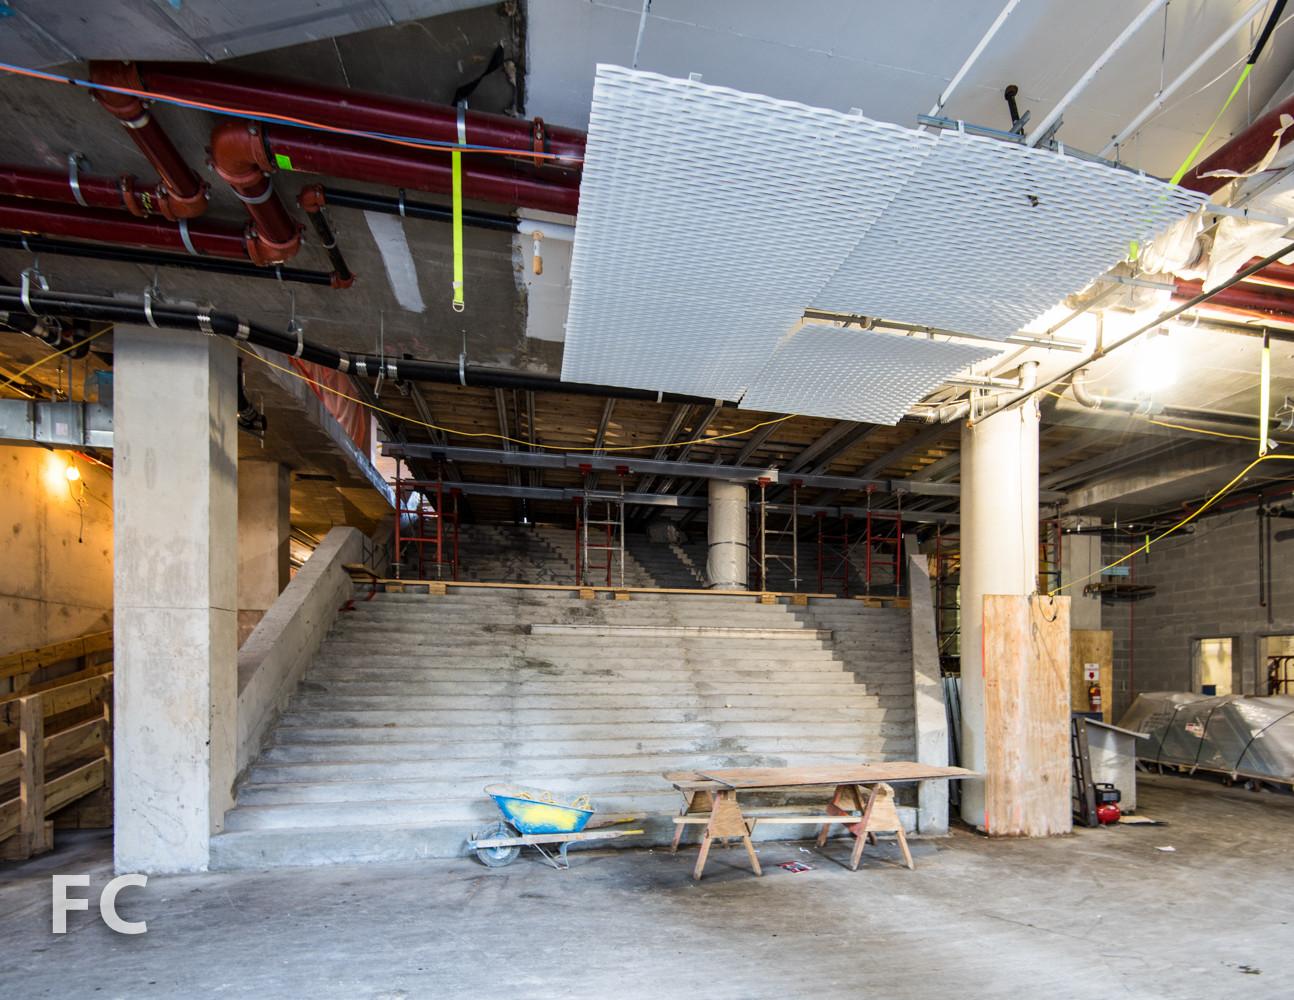 Escalera central. Imagen © Field Condition